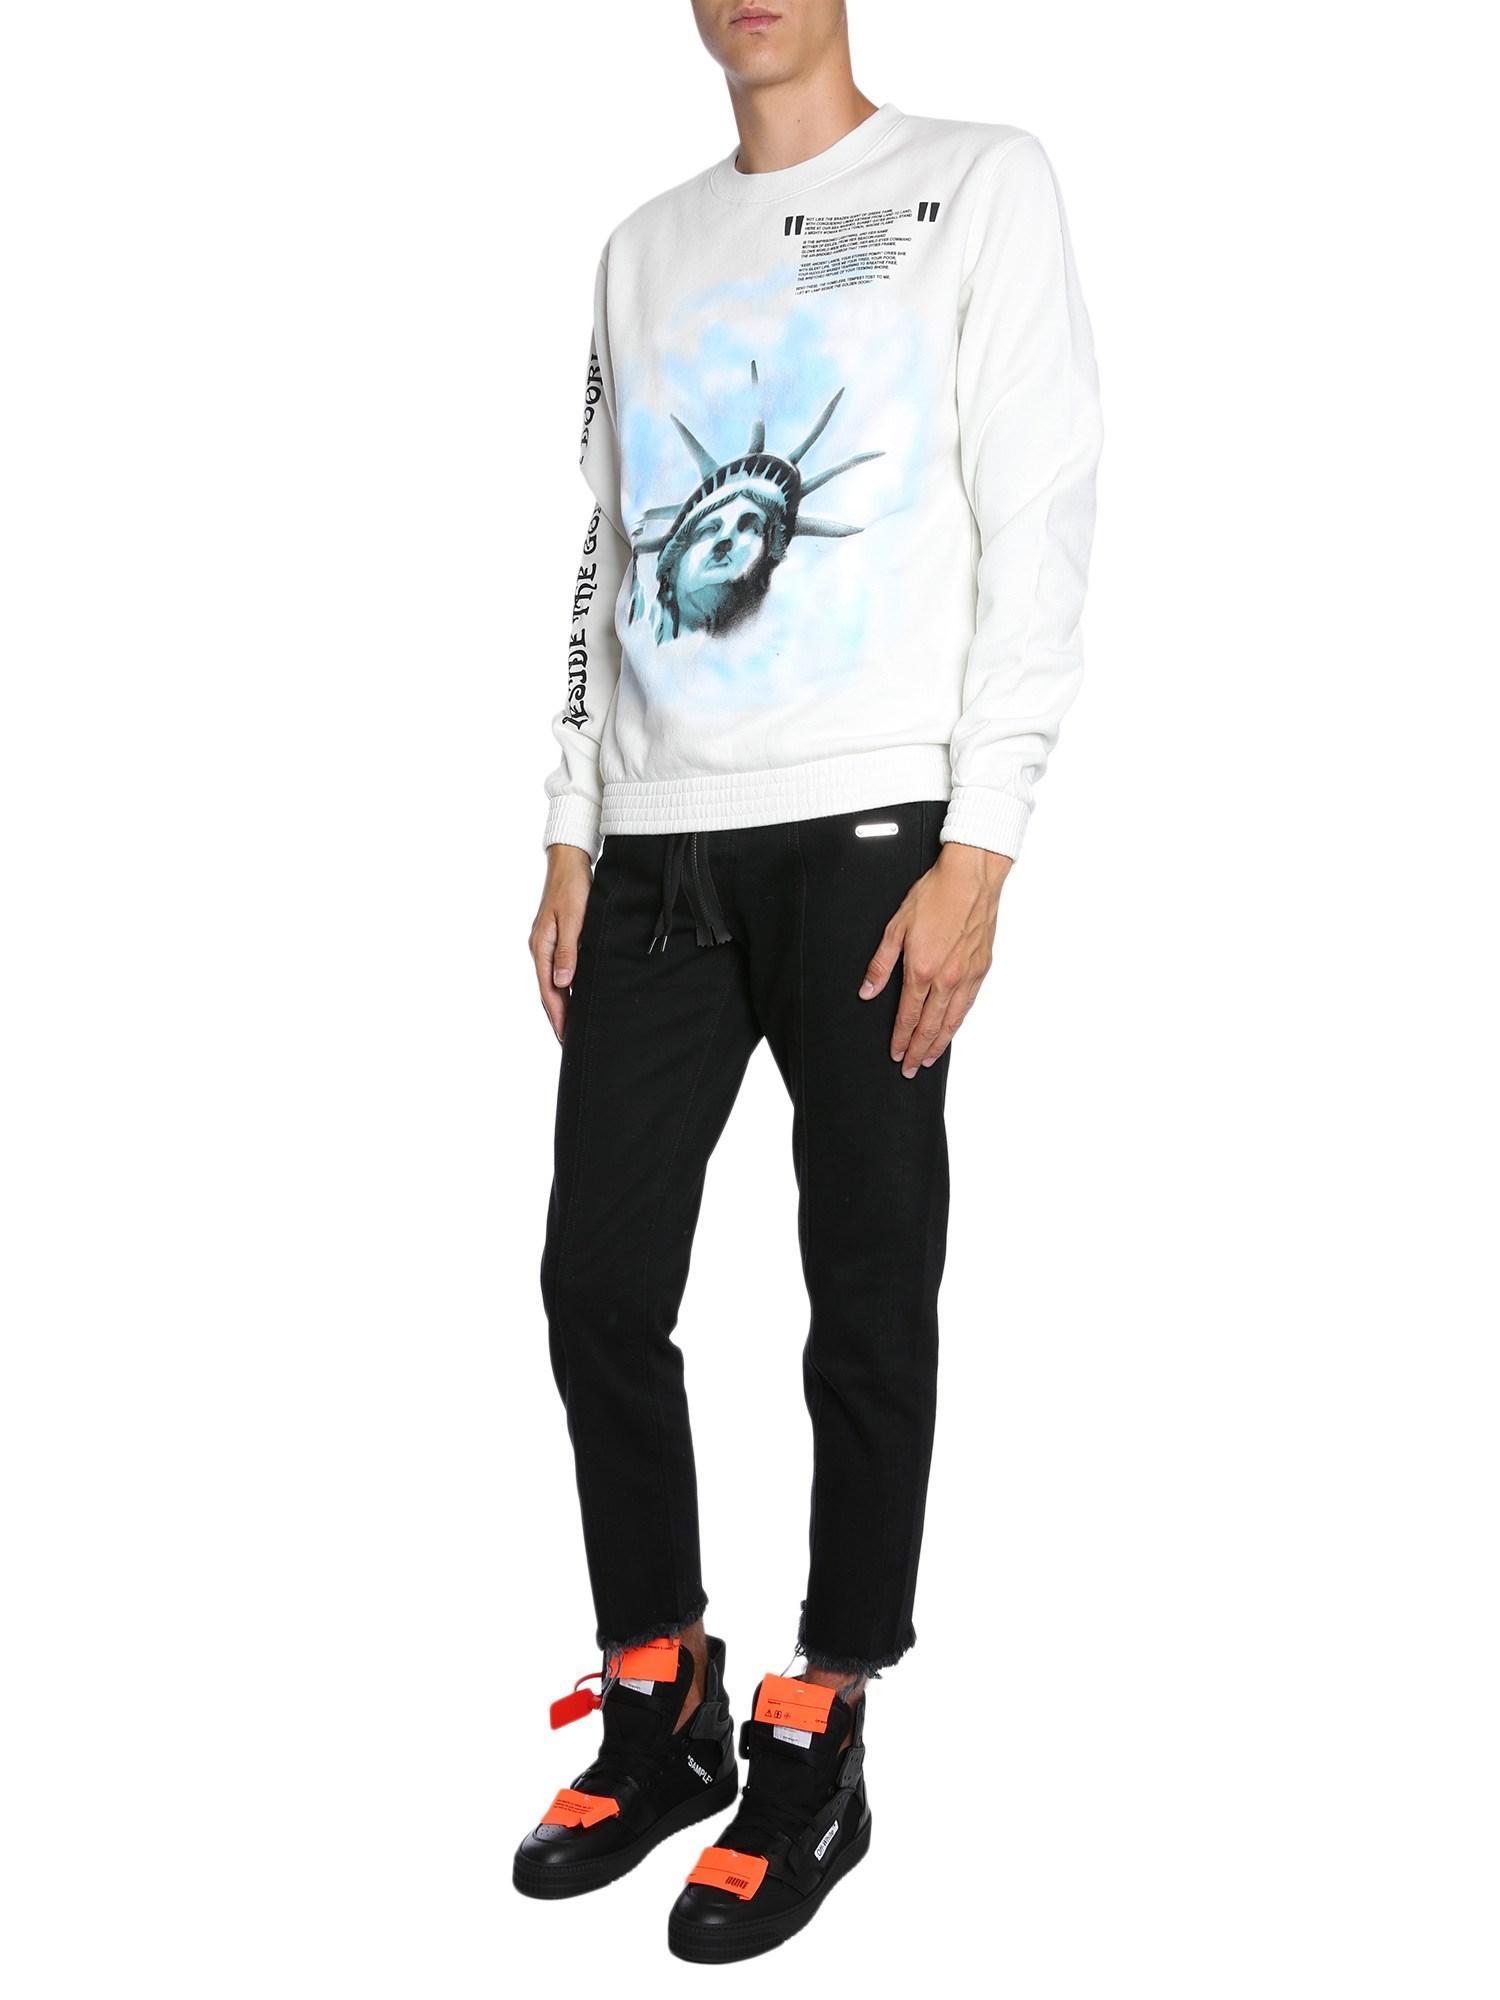 61970808f462 Off-White C O Virgil Abloh Round Collar Cotton Sweatshirt With ...